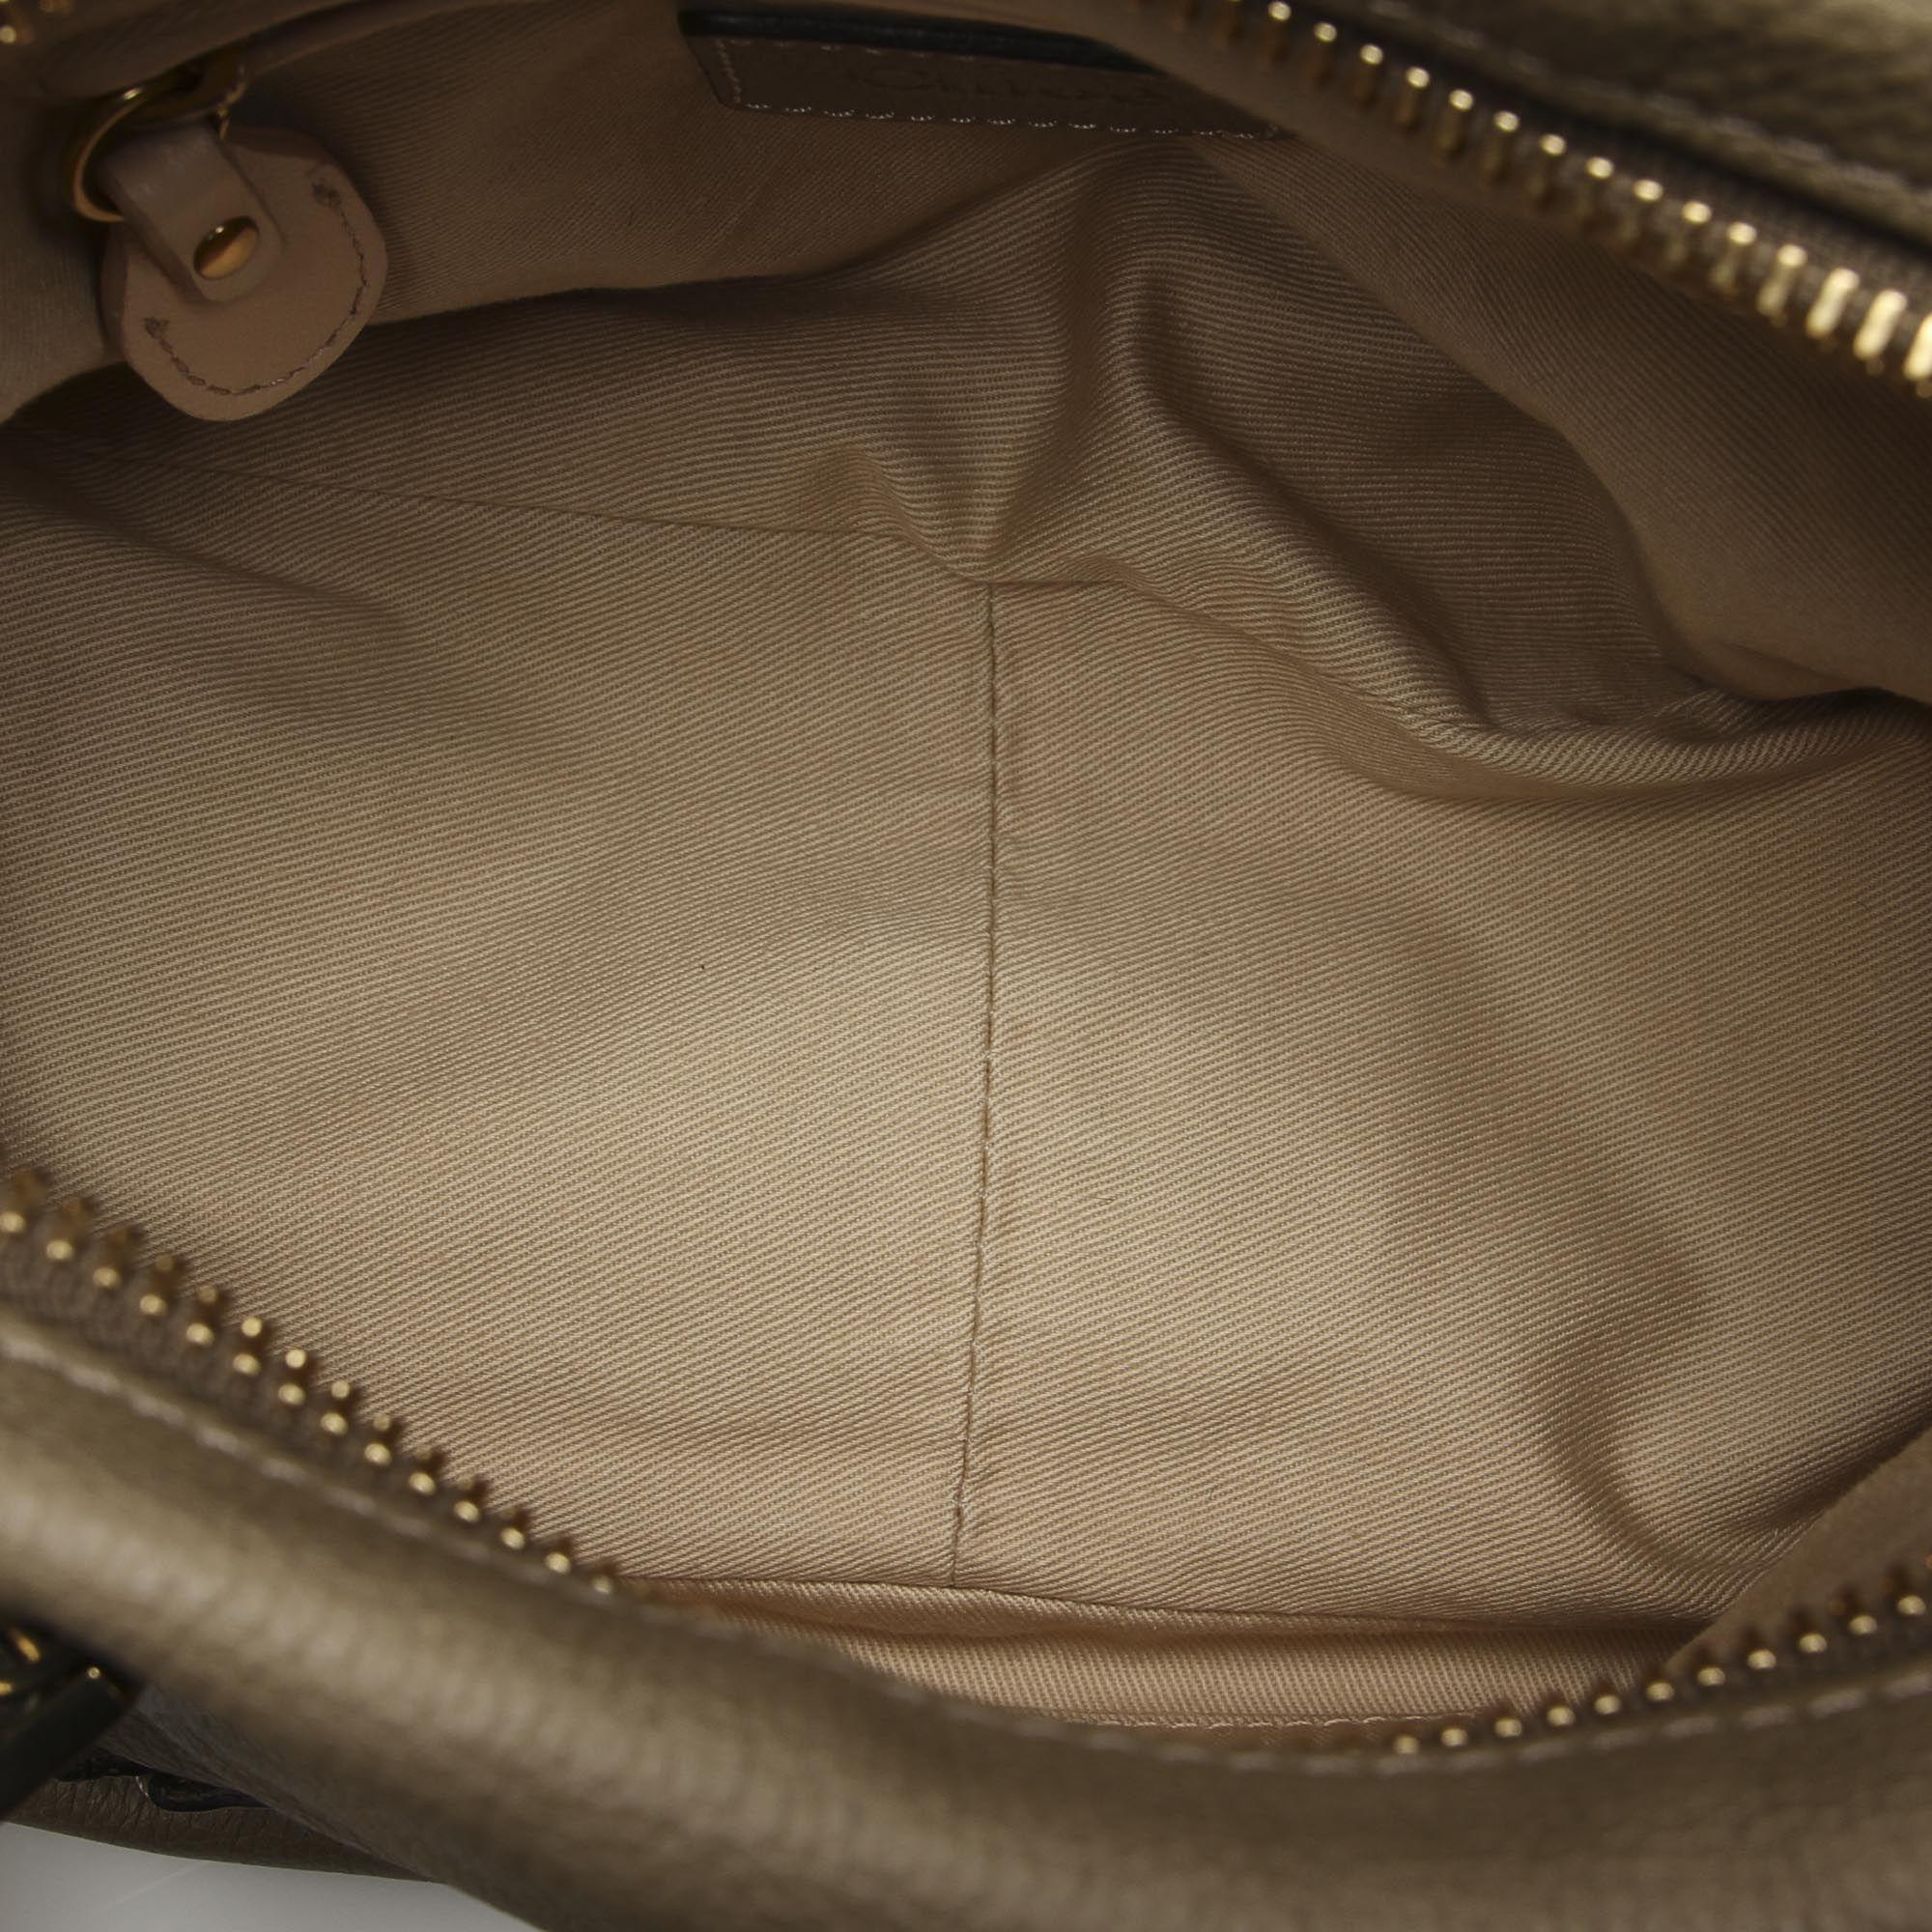 Vintage Chloe Small Paraty Leather Satchel Gray